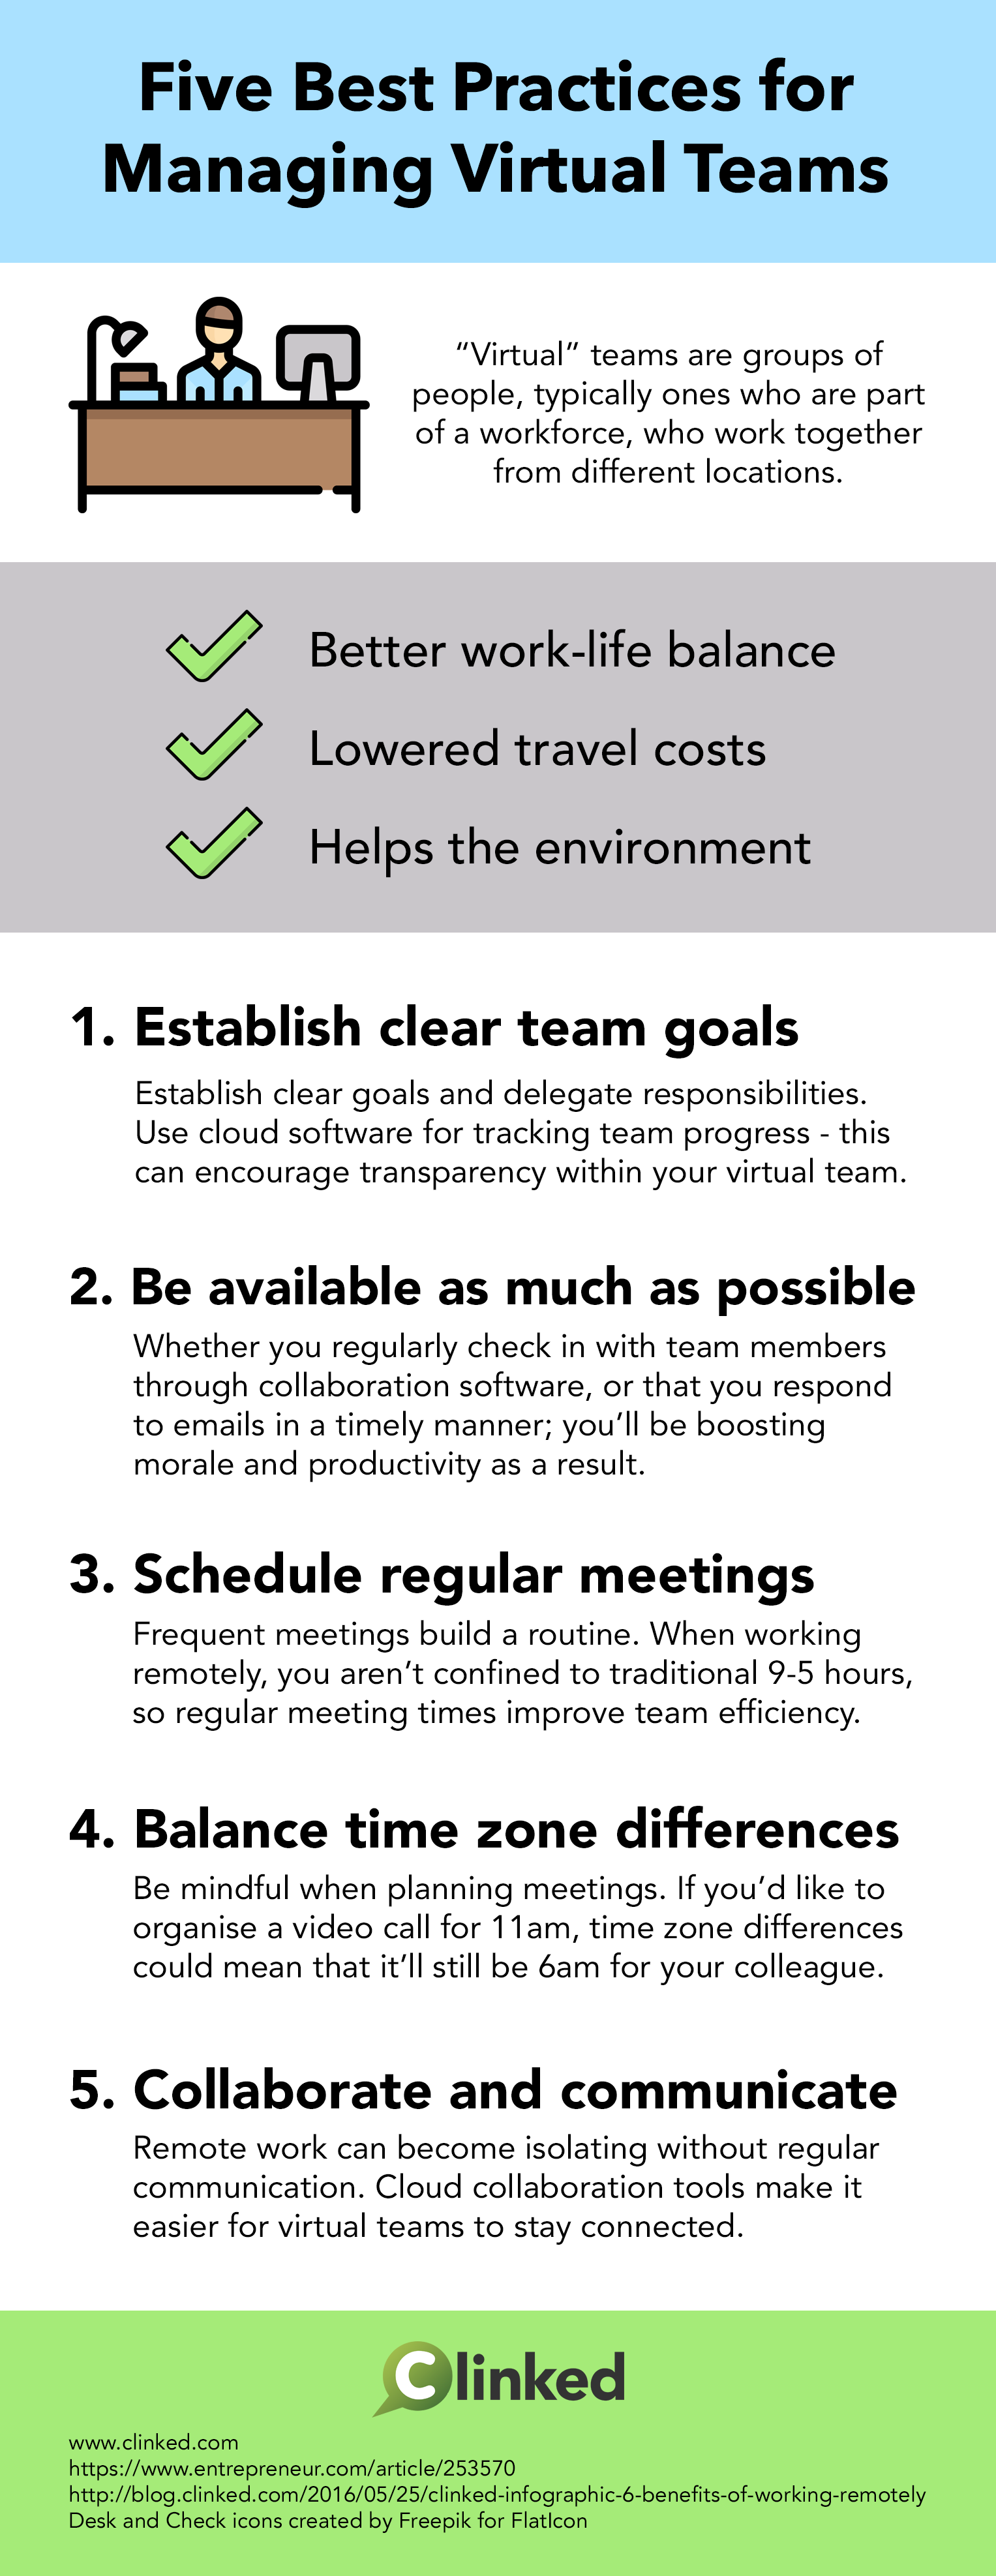 Five Tips For Managing Virtual Teams.png